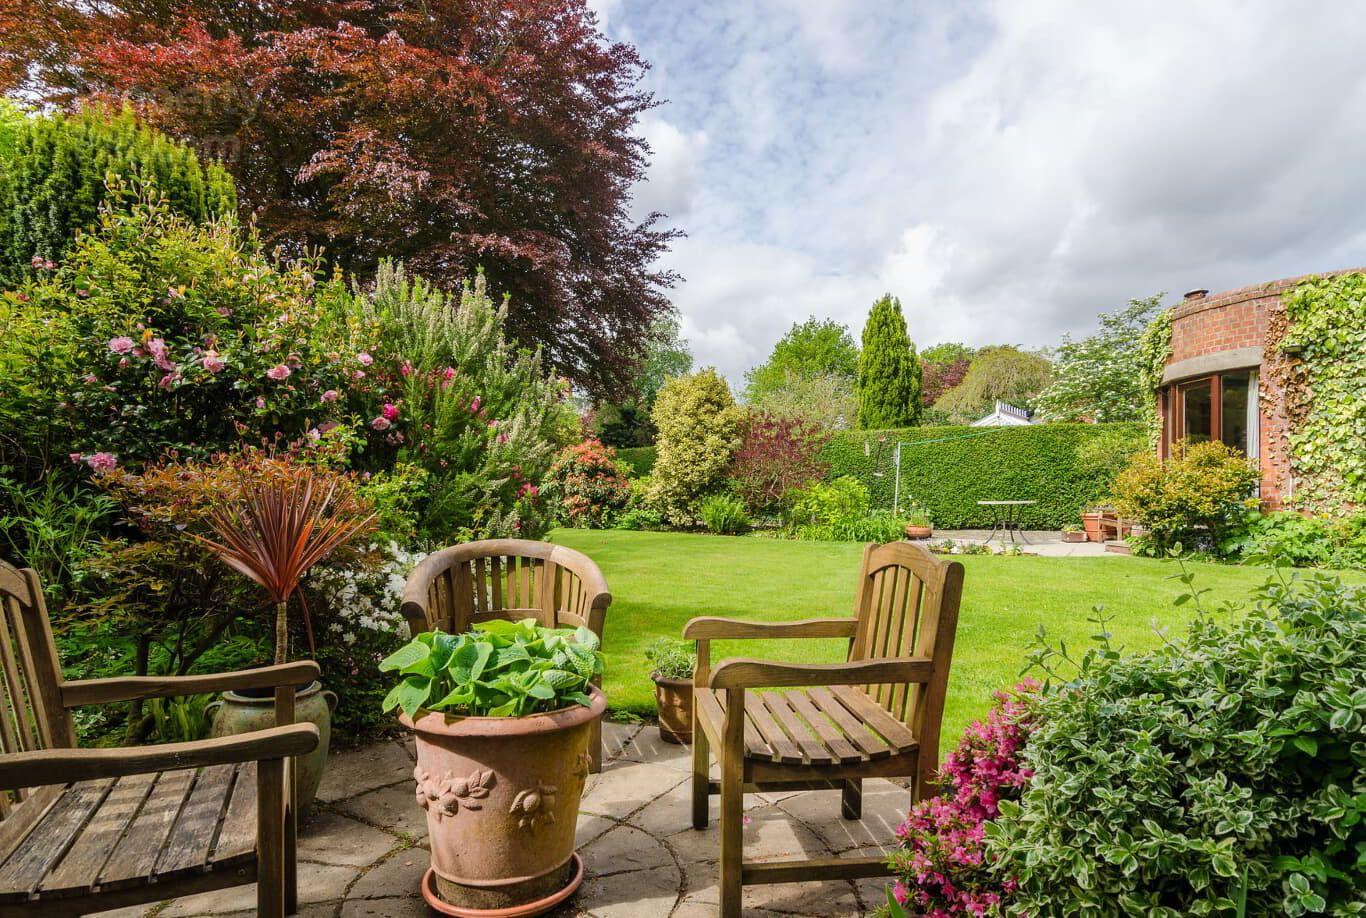 37 Adelaide Park, Off Malone Road, Belfast Small garden